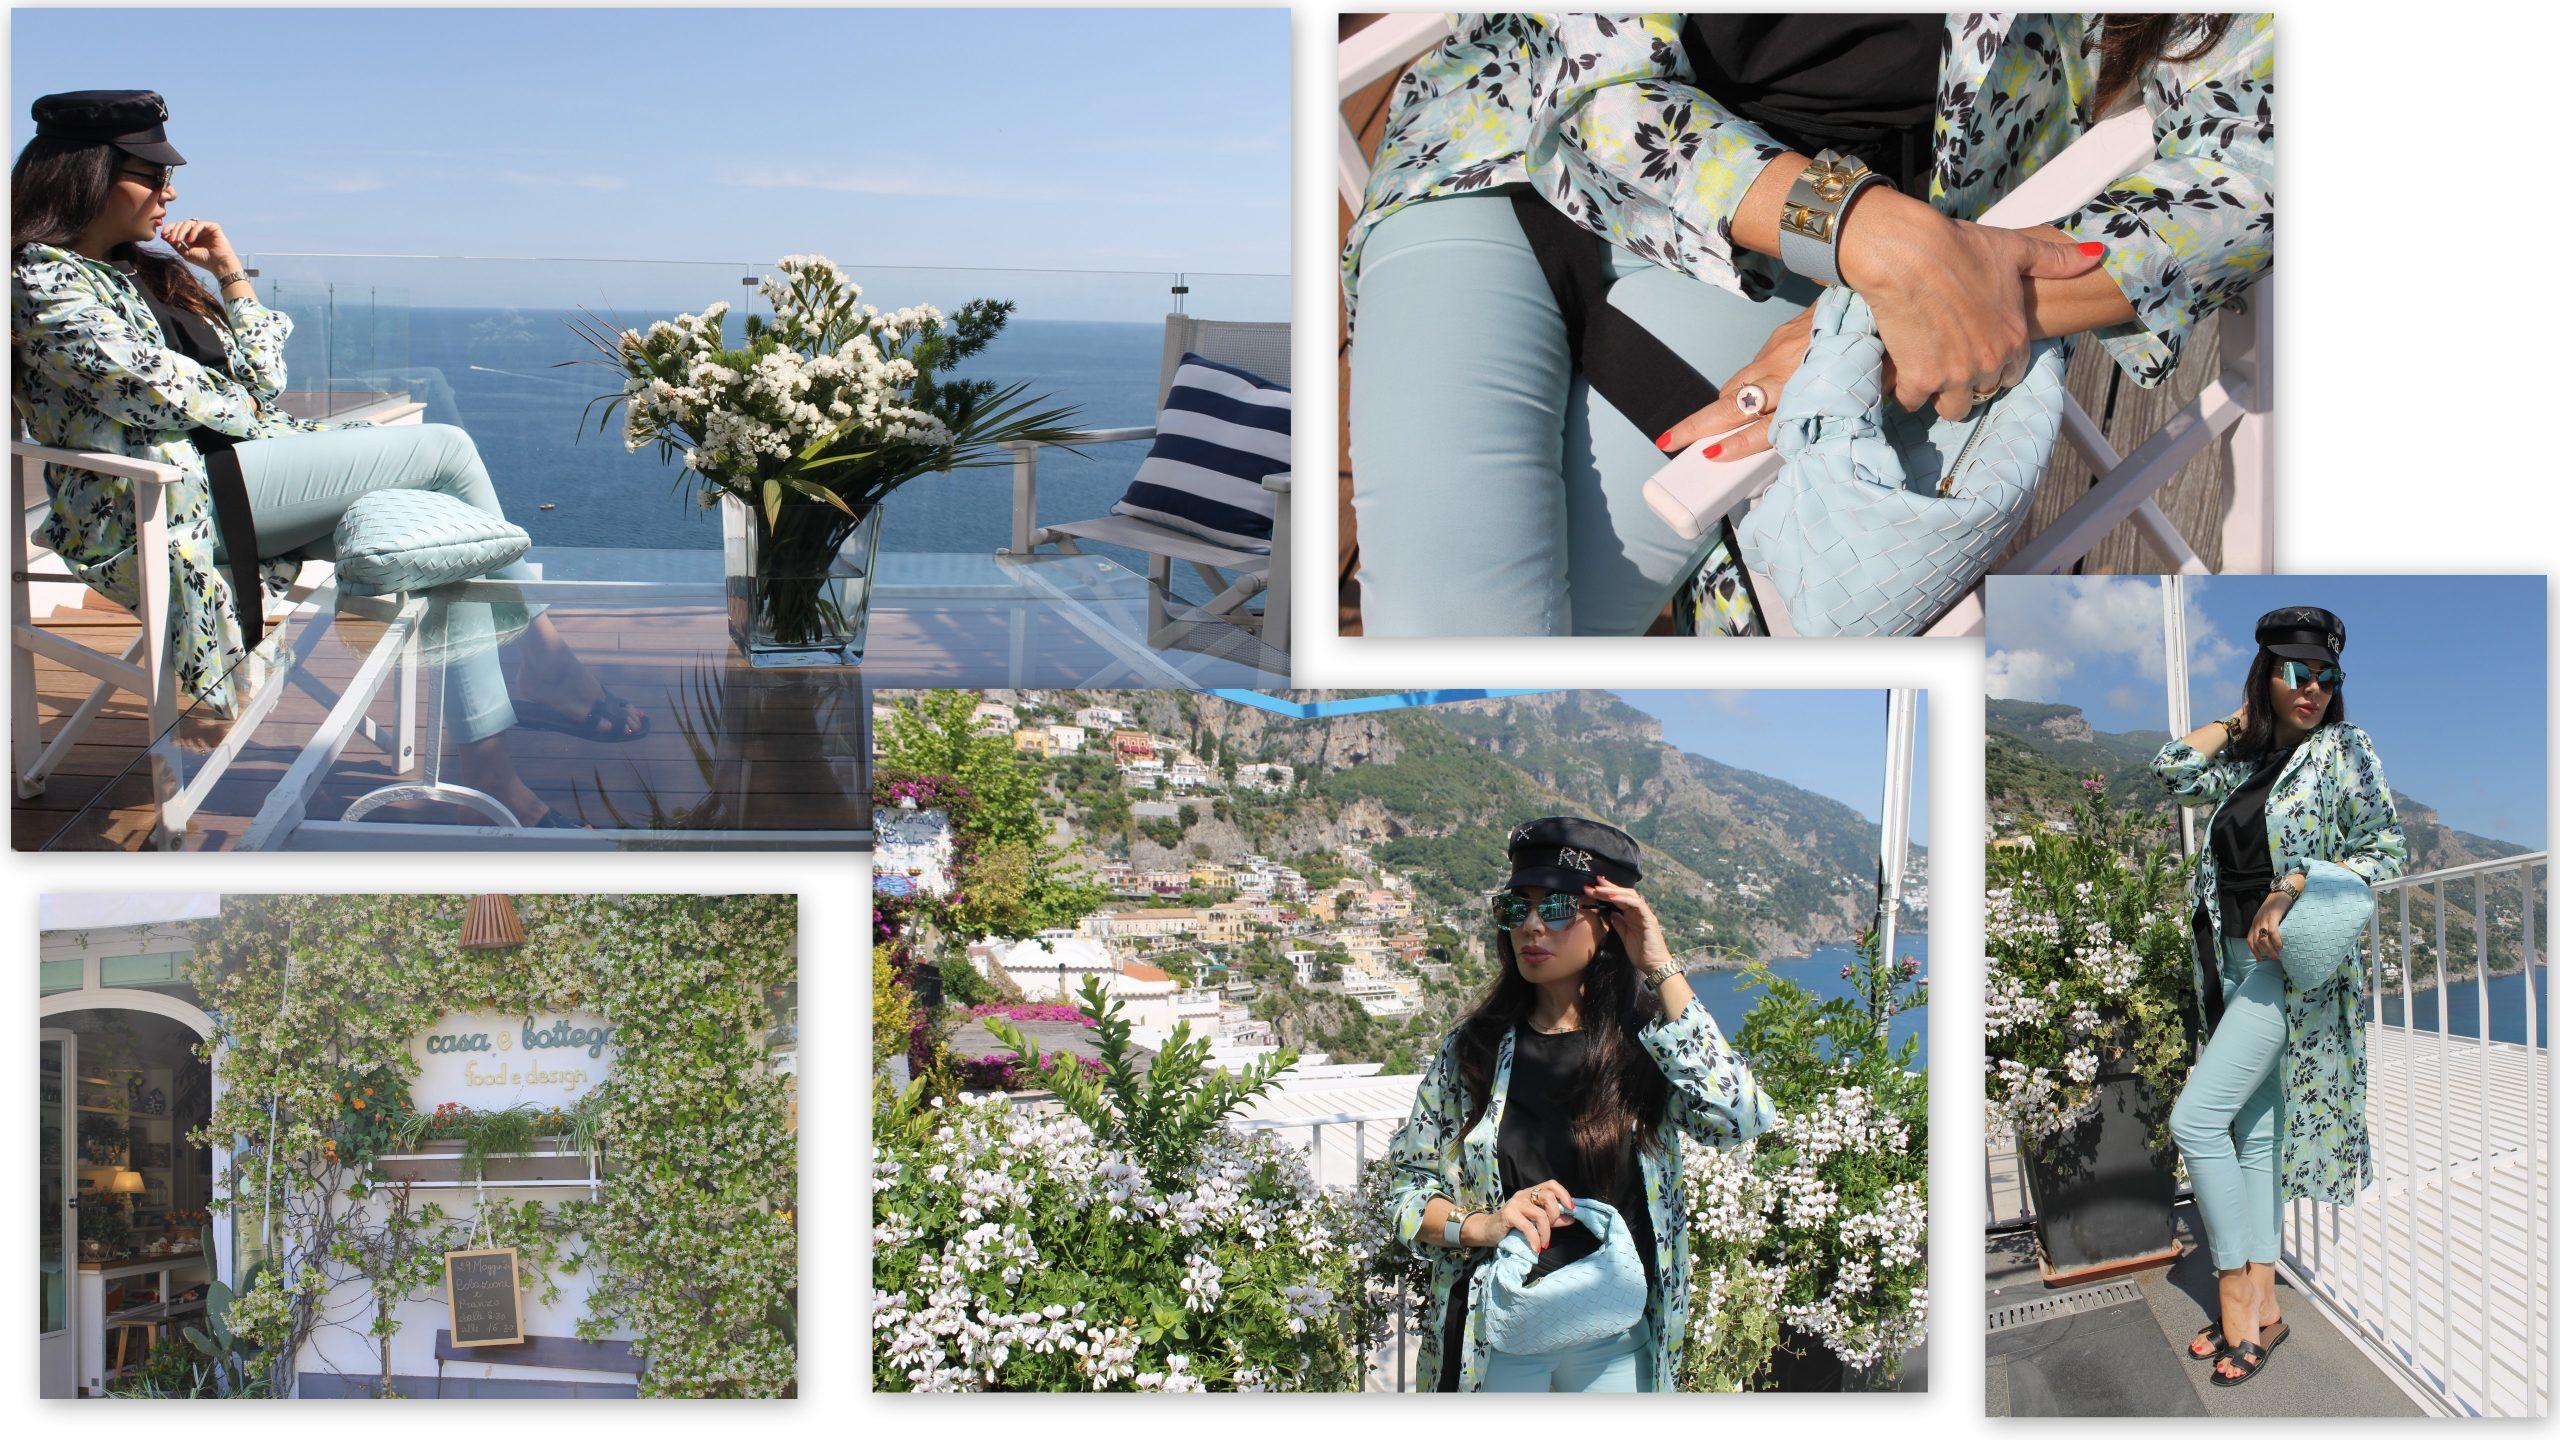 Positano Amalfi Coast Travel Summer Vacation Staycation Light Blue Summer 2021 Trend Paola Lauretano